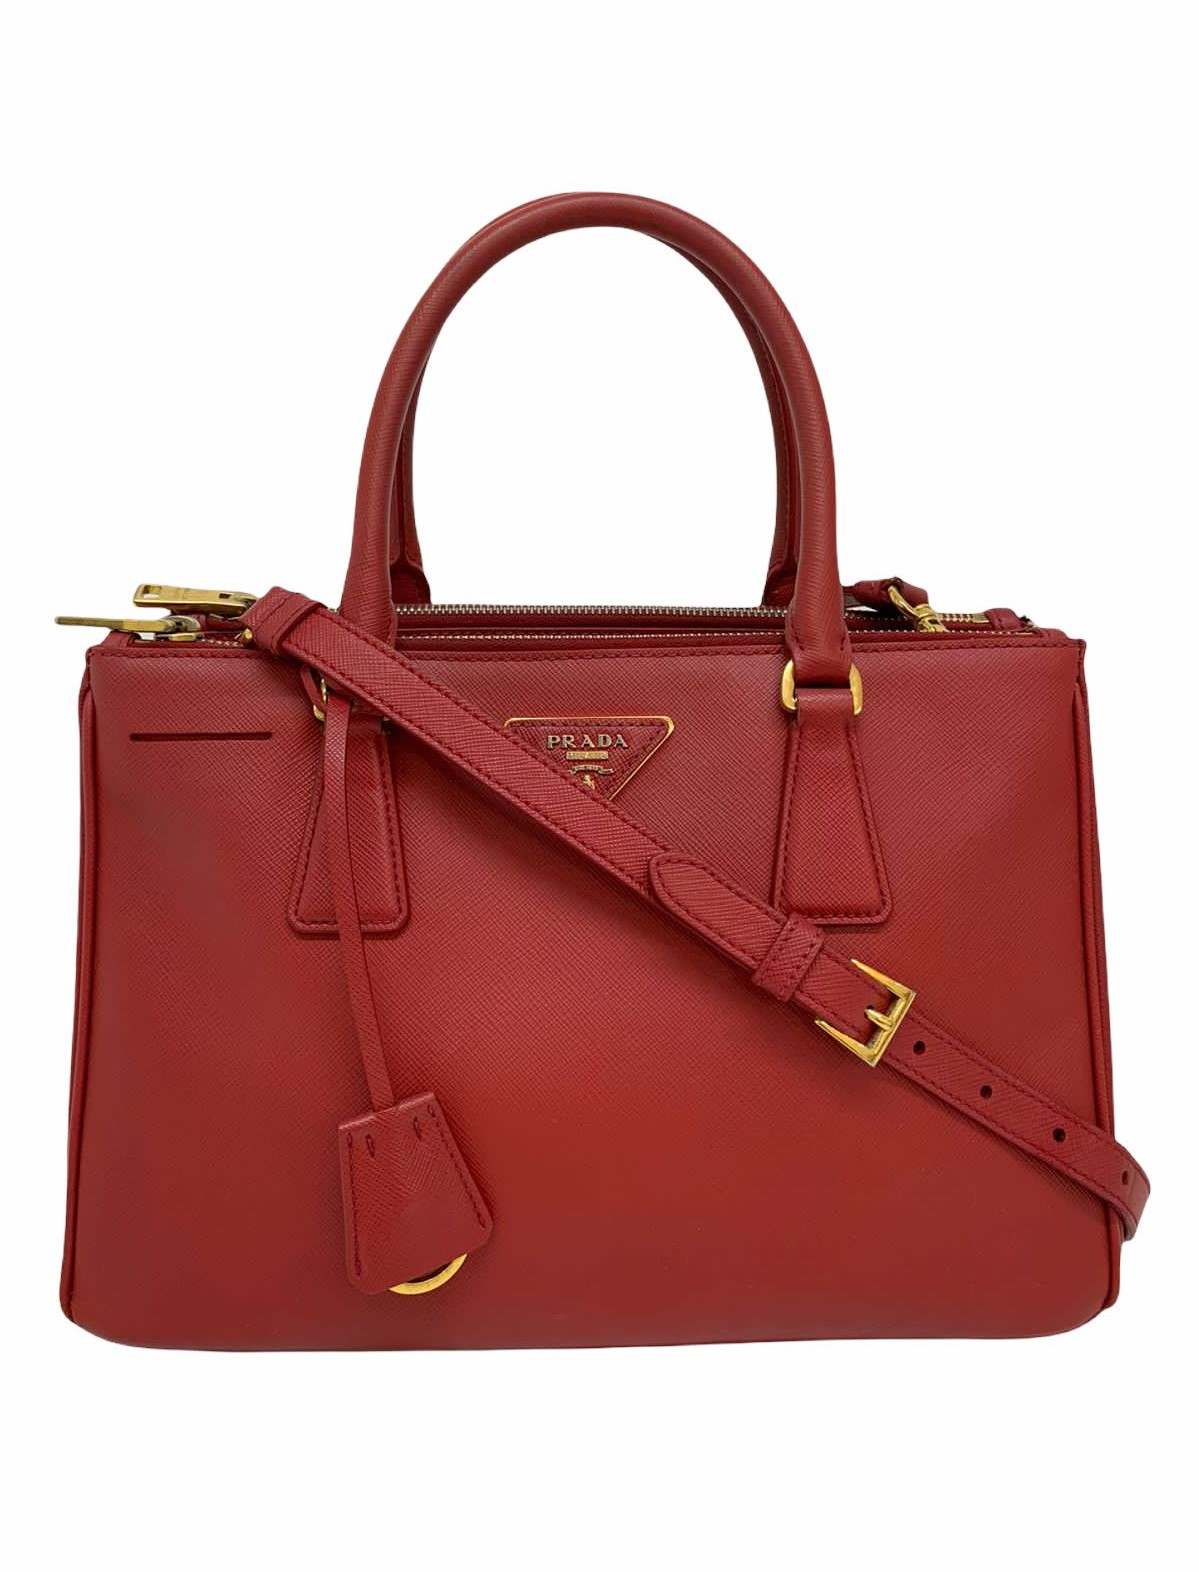 Bolsa Prada Double Zip Lux Tote Saffiano Small Vermelha